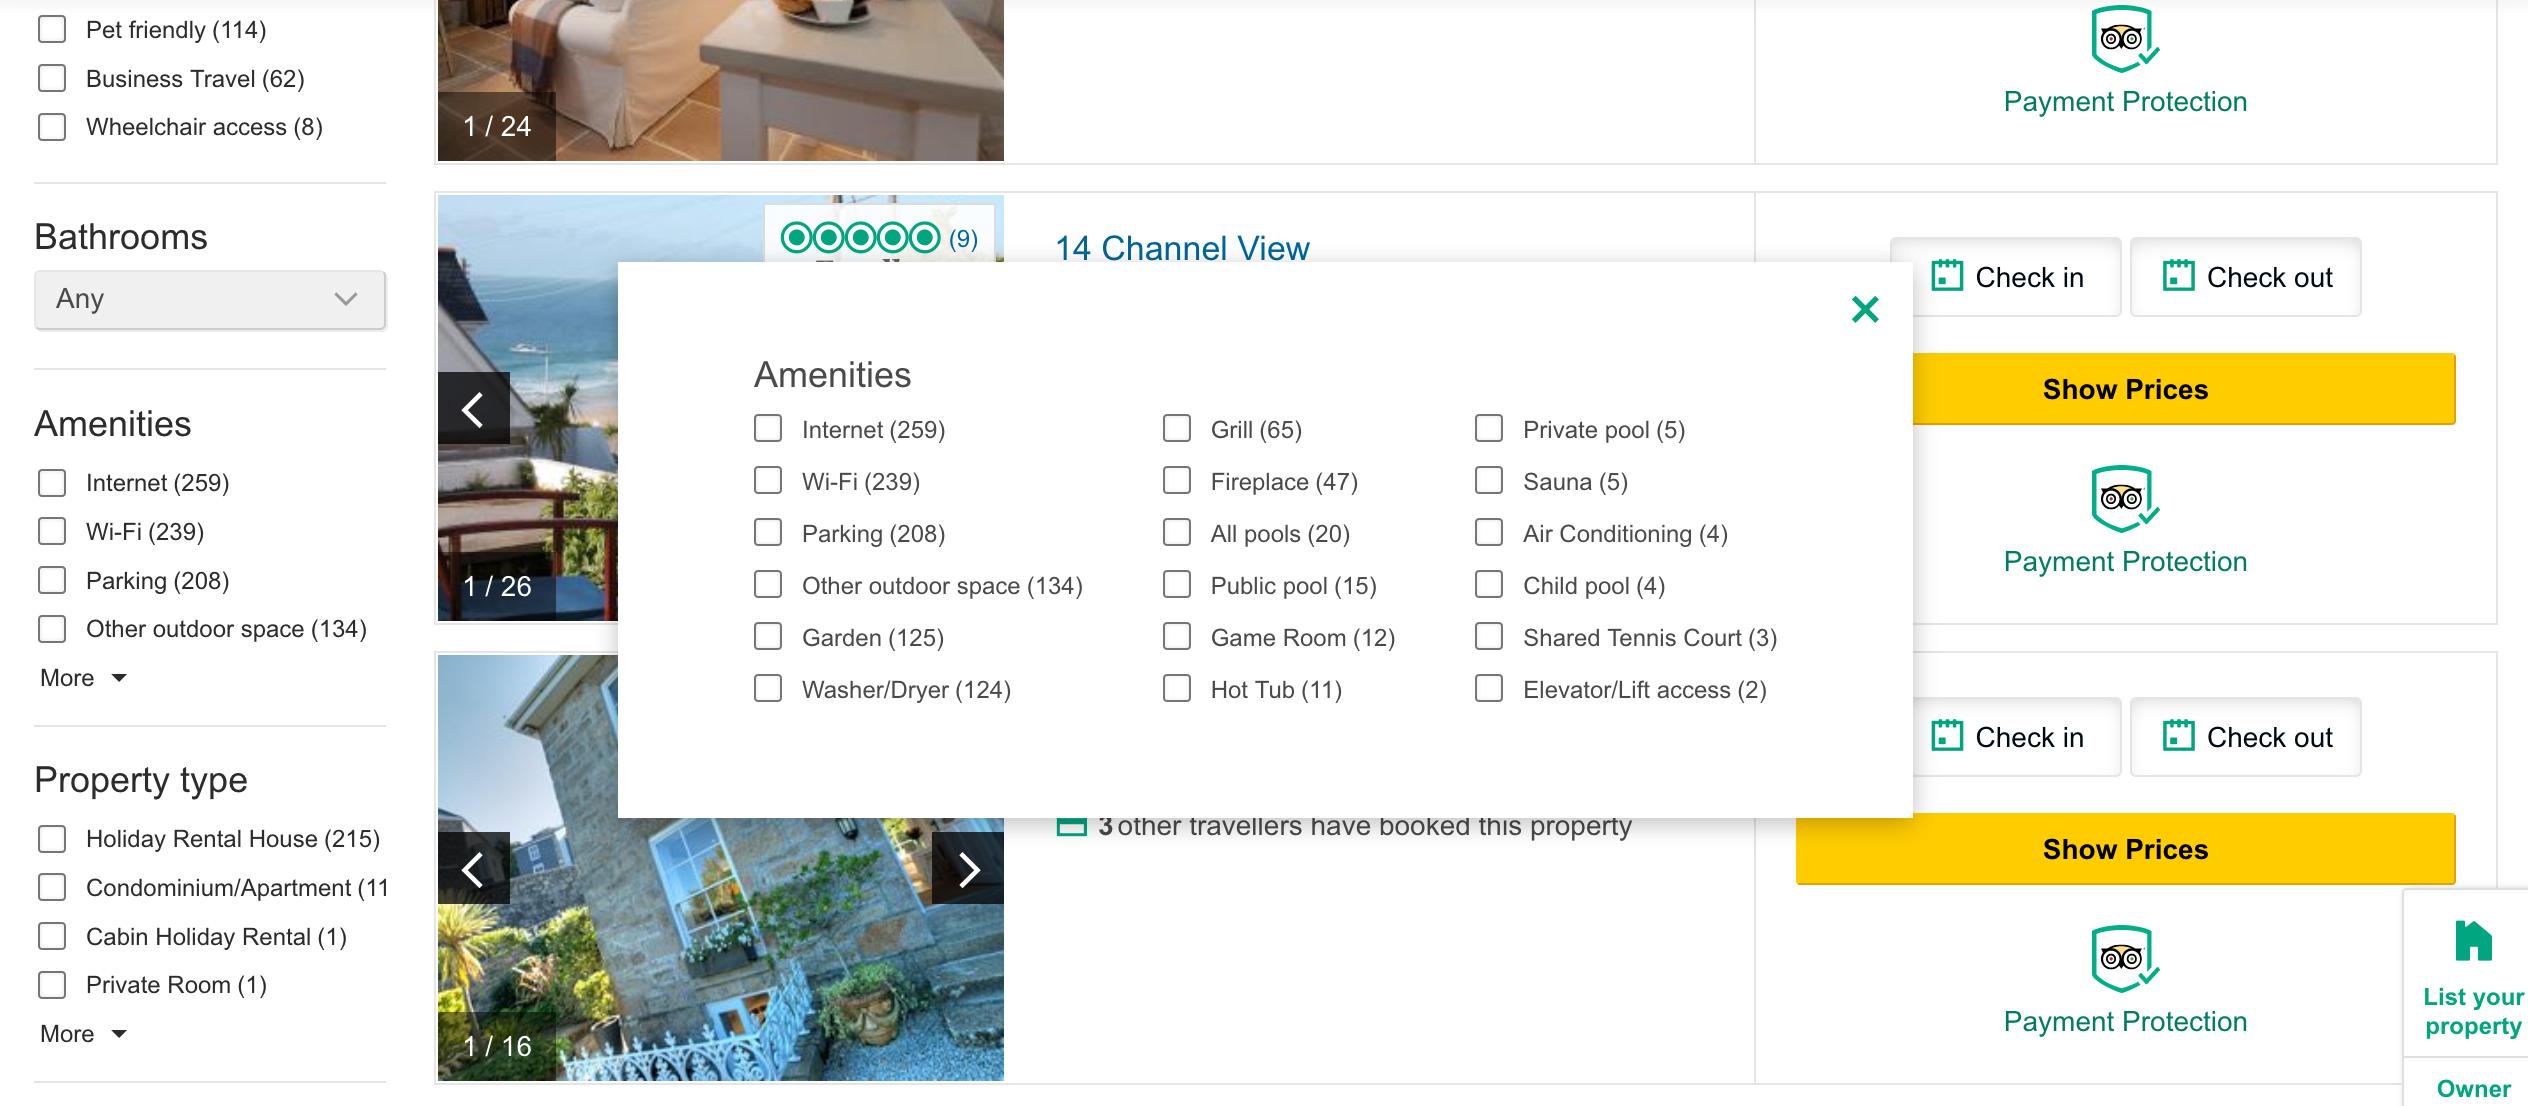 TripAdvisor listings page filters pop-up